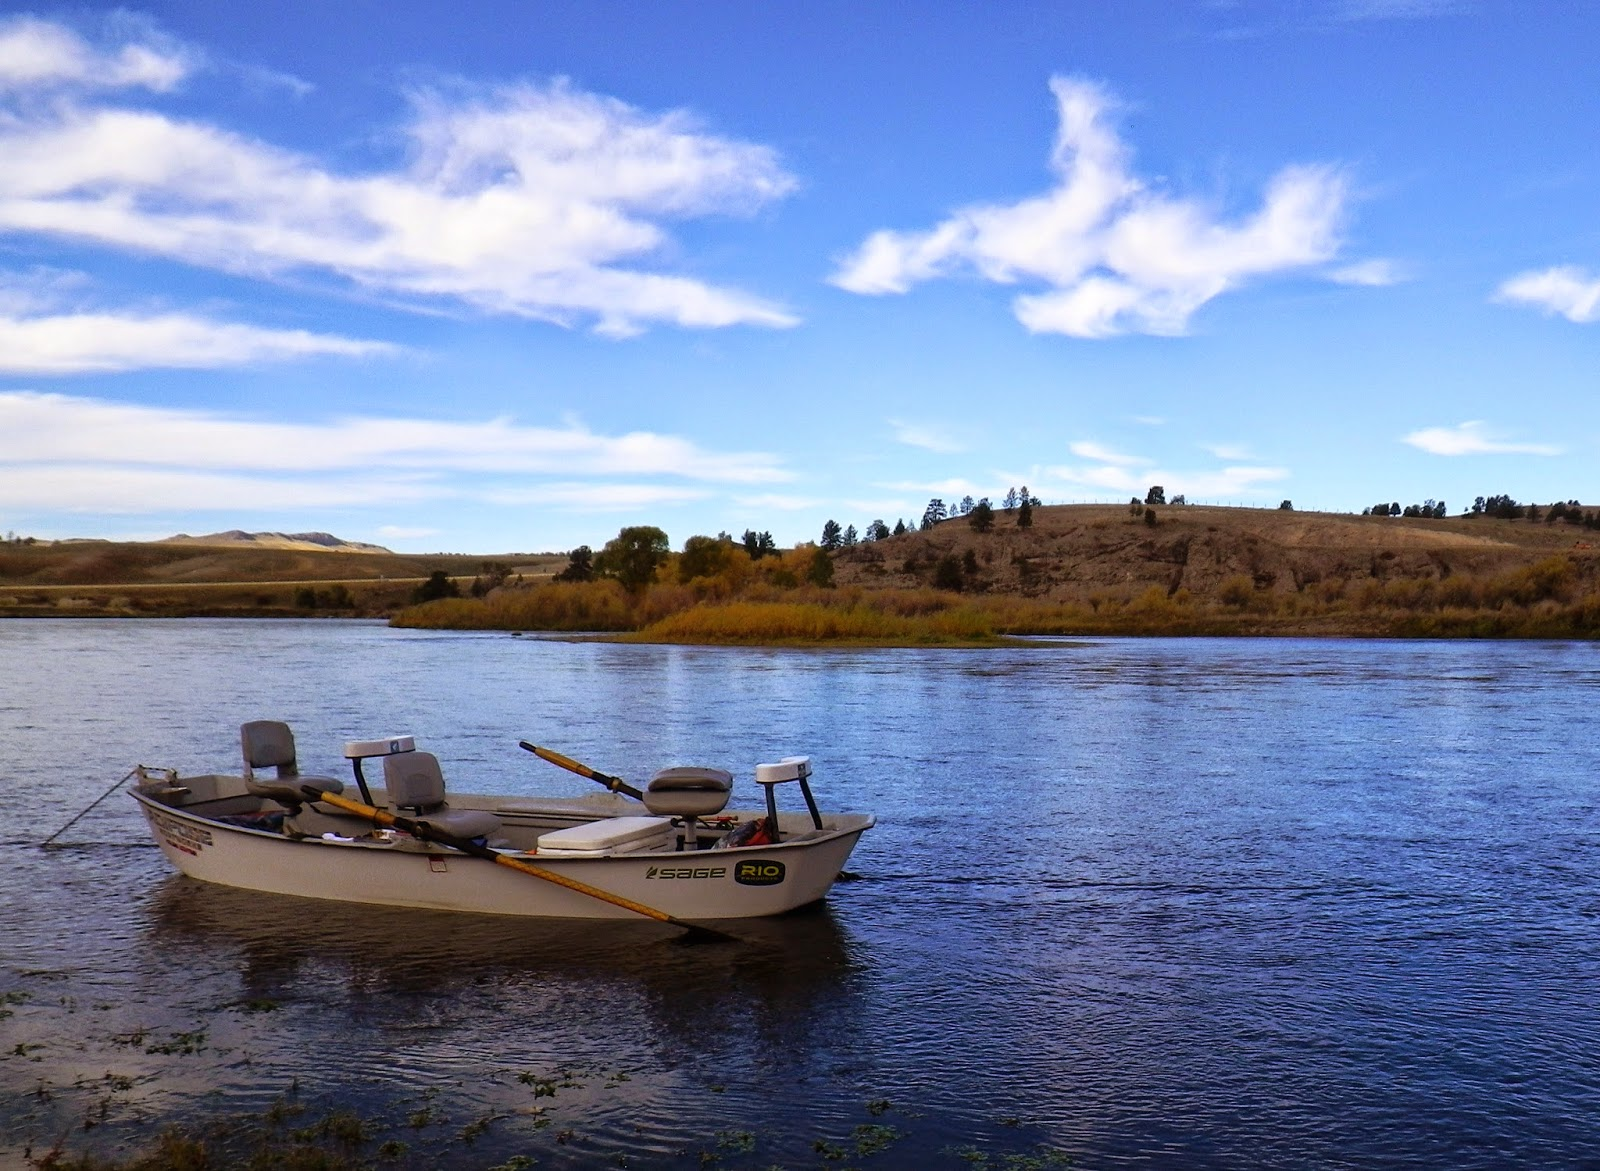 Montana: Missouri River - Fly Fishing